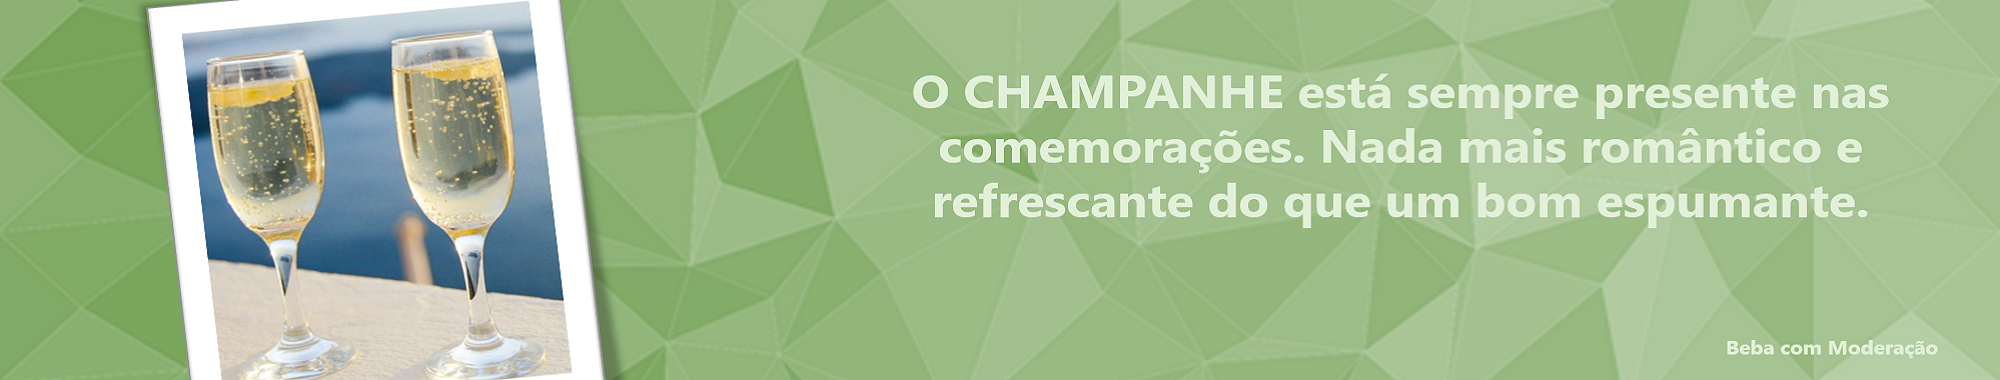 Banner Champanhe